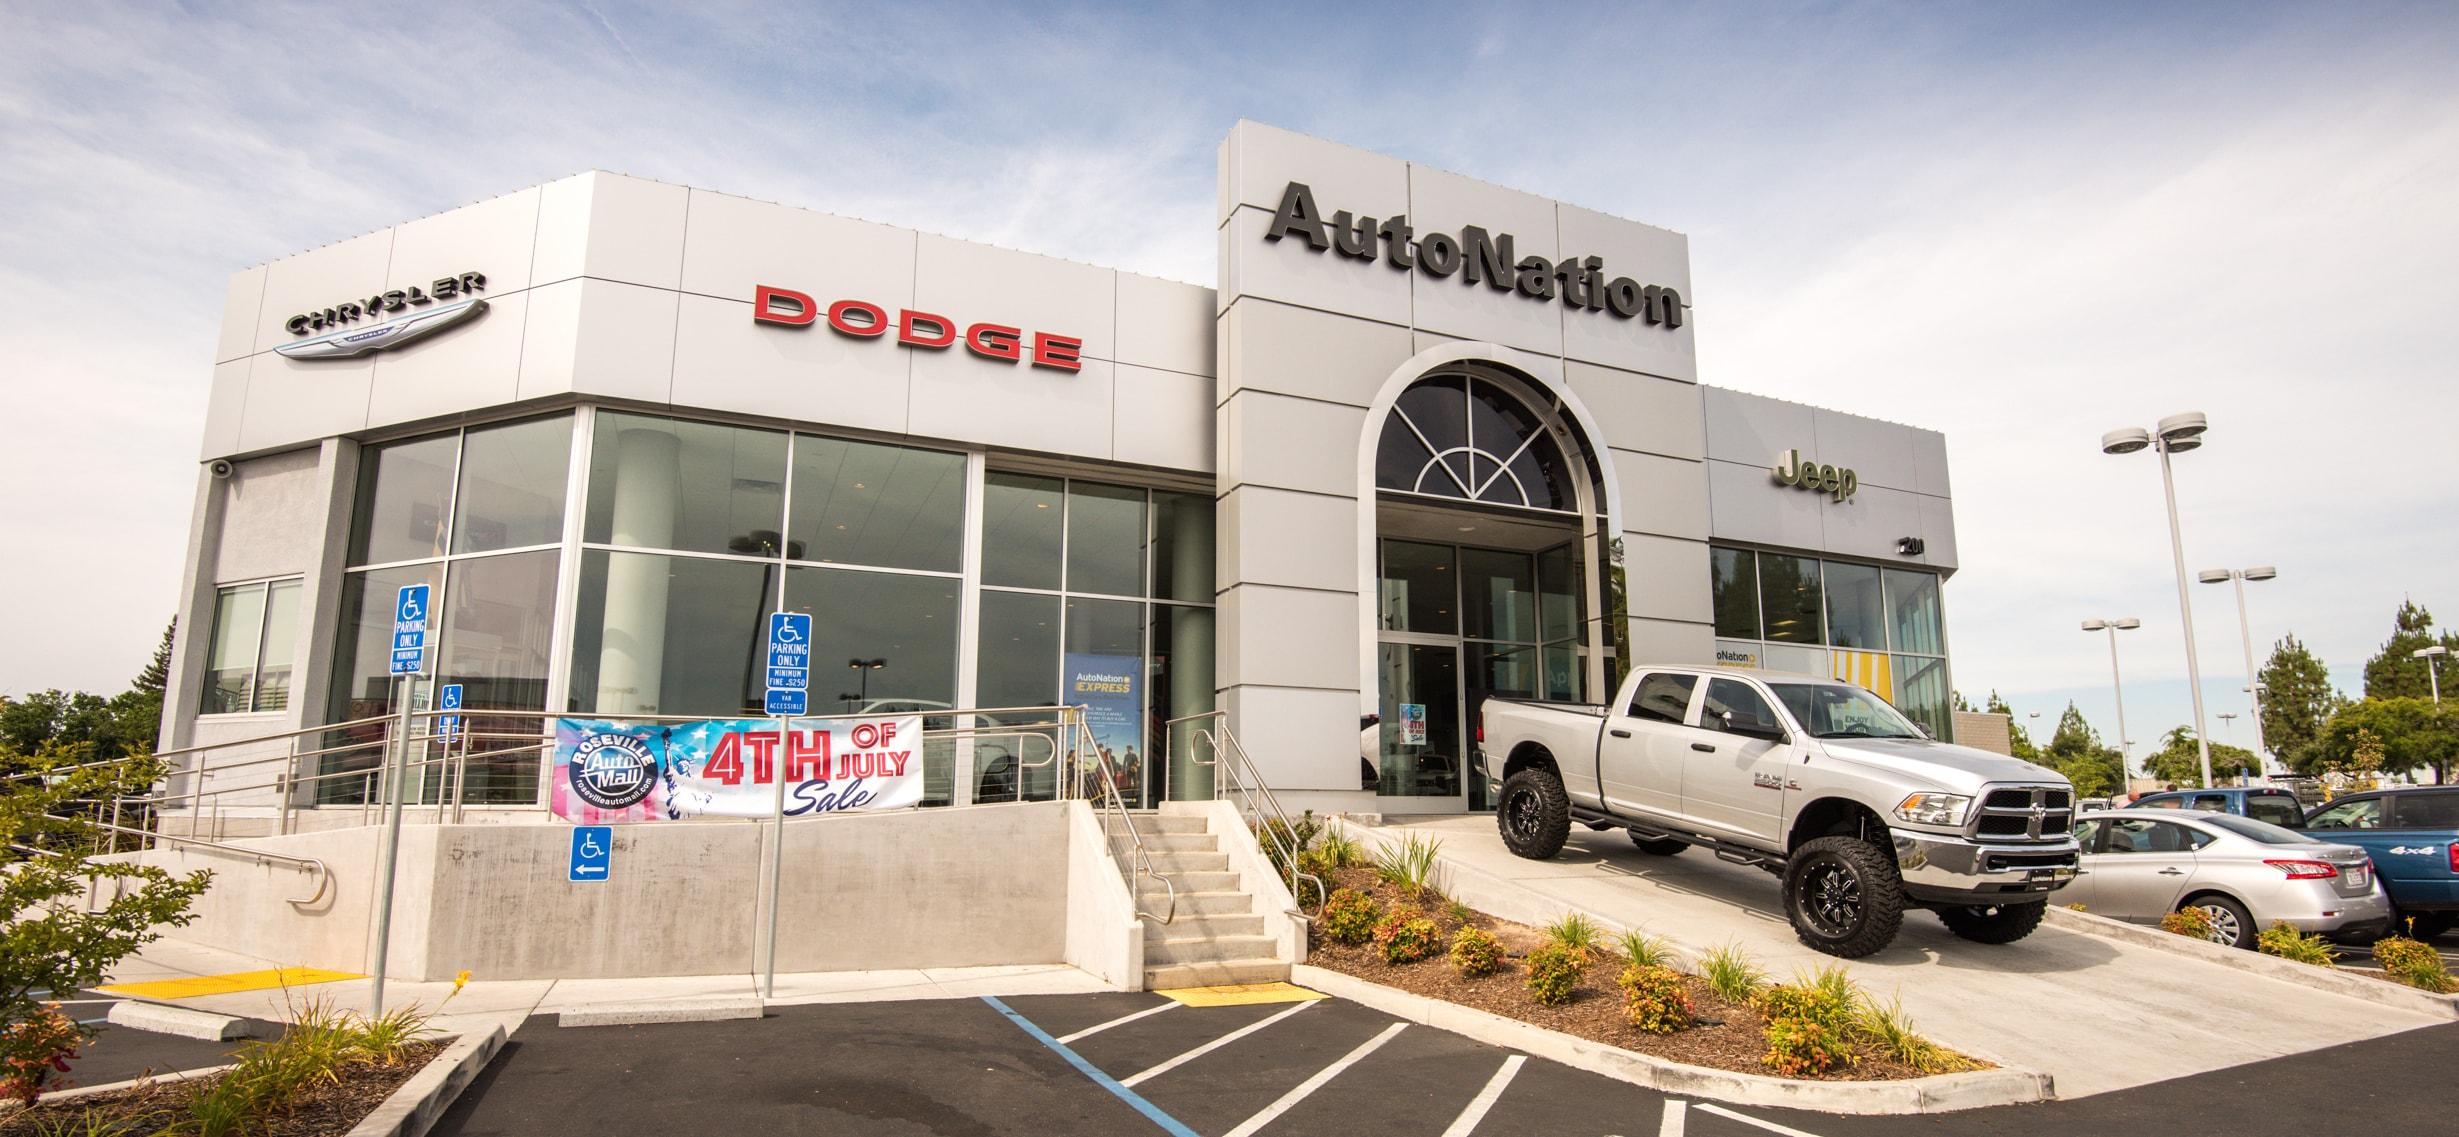 About AutoNation Chrysler Dodge Jeep RAM Roseville